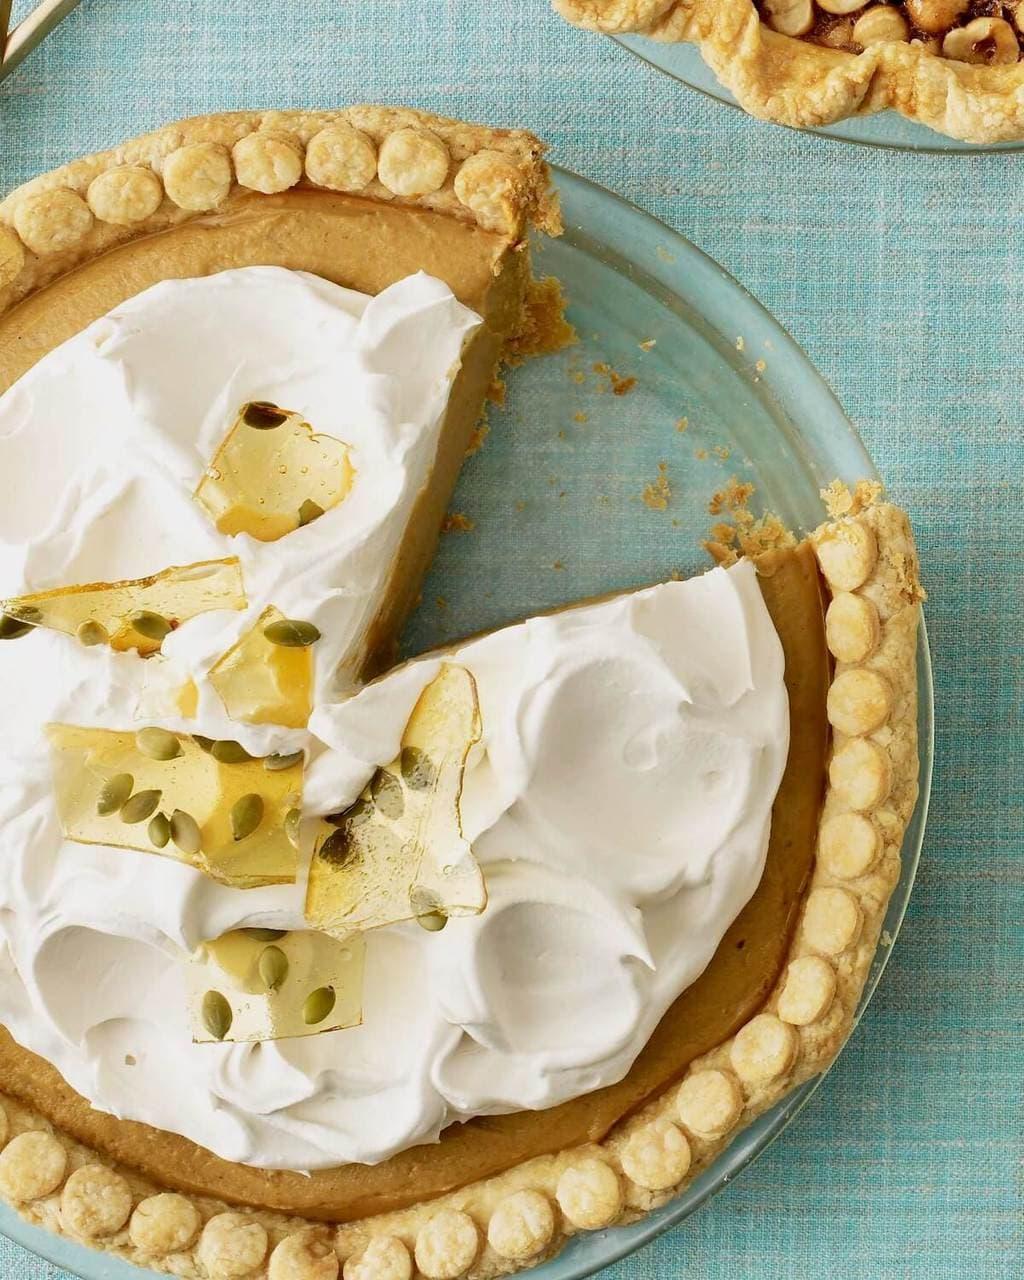 Overhead image of Pumpkin Cream Pie with piece missing